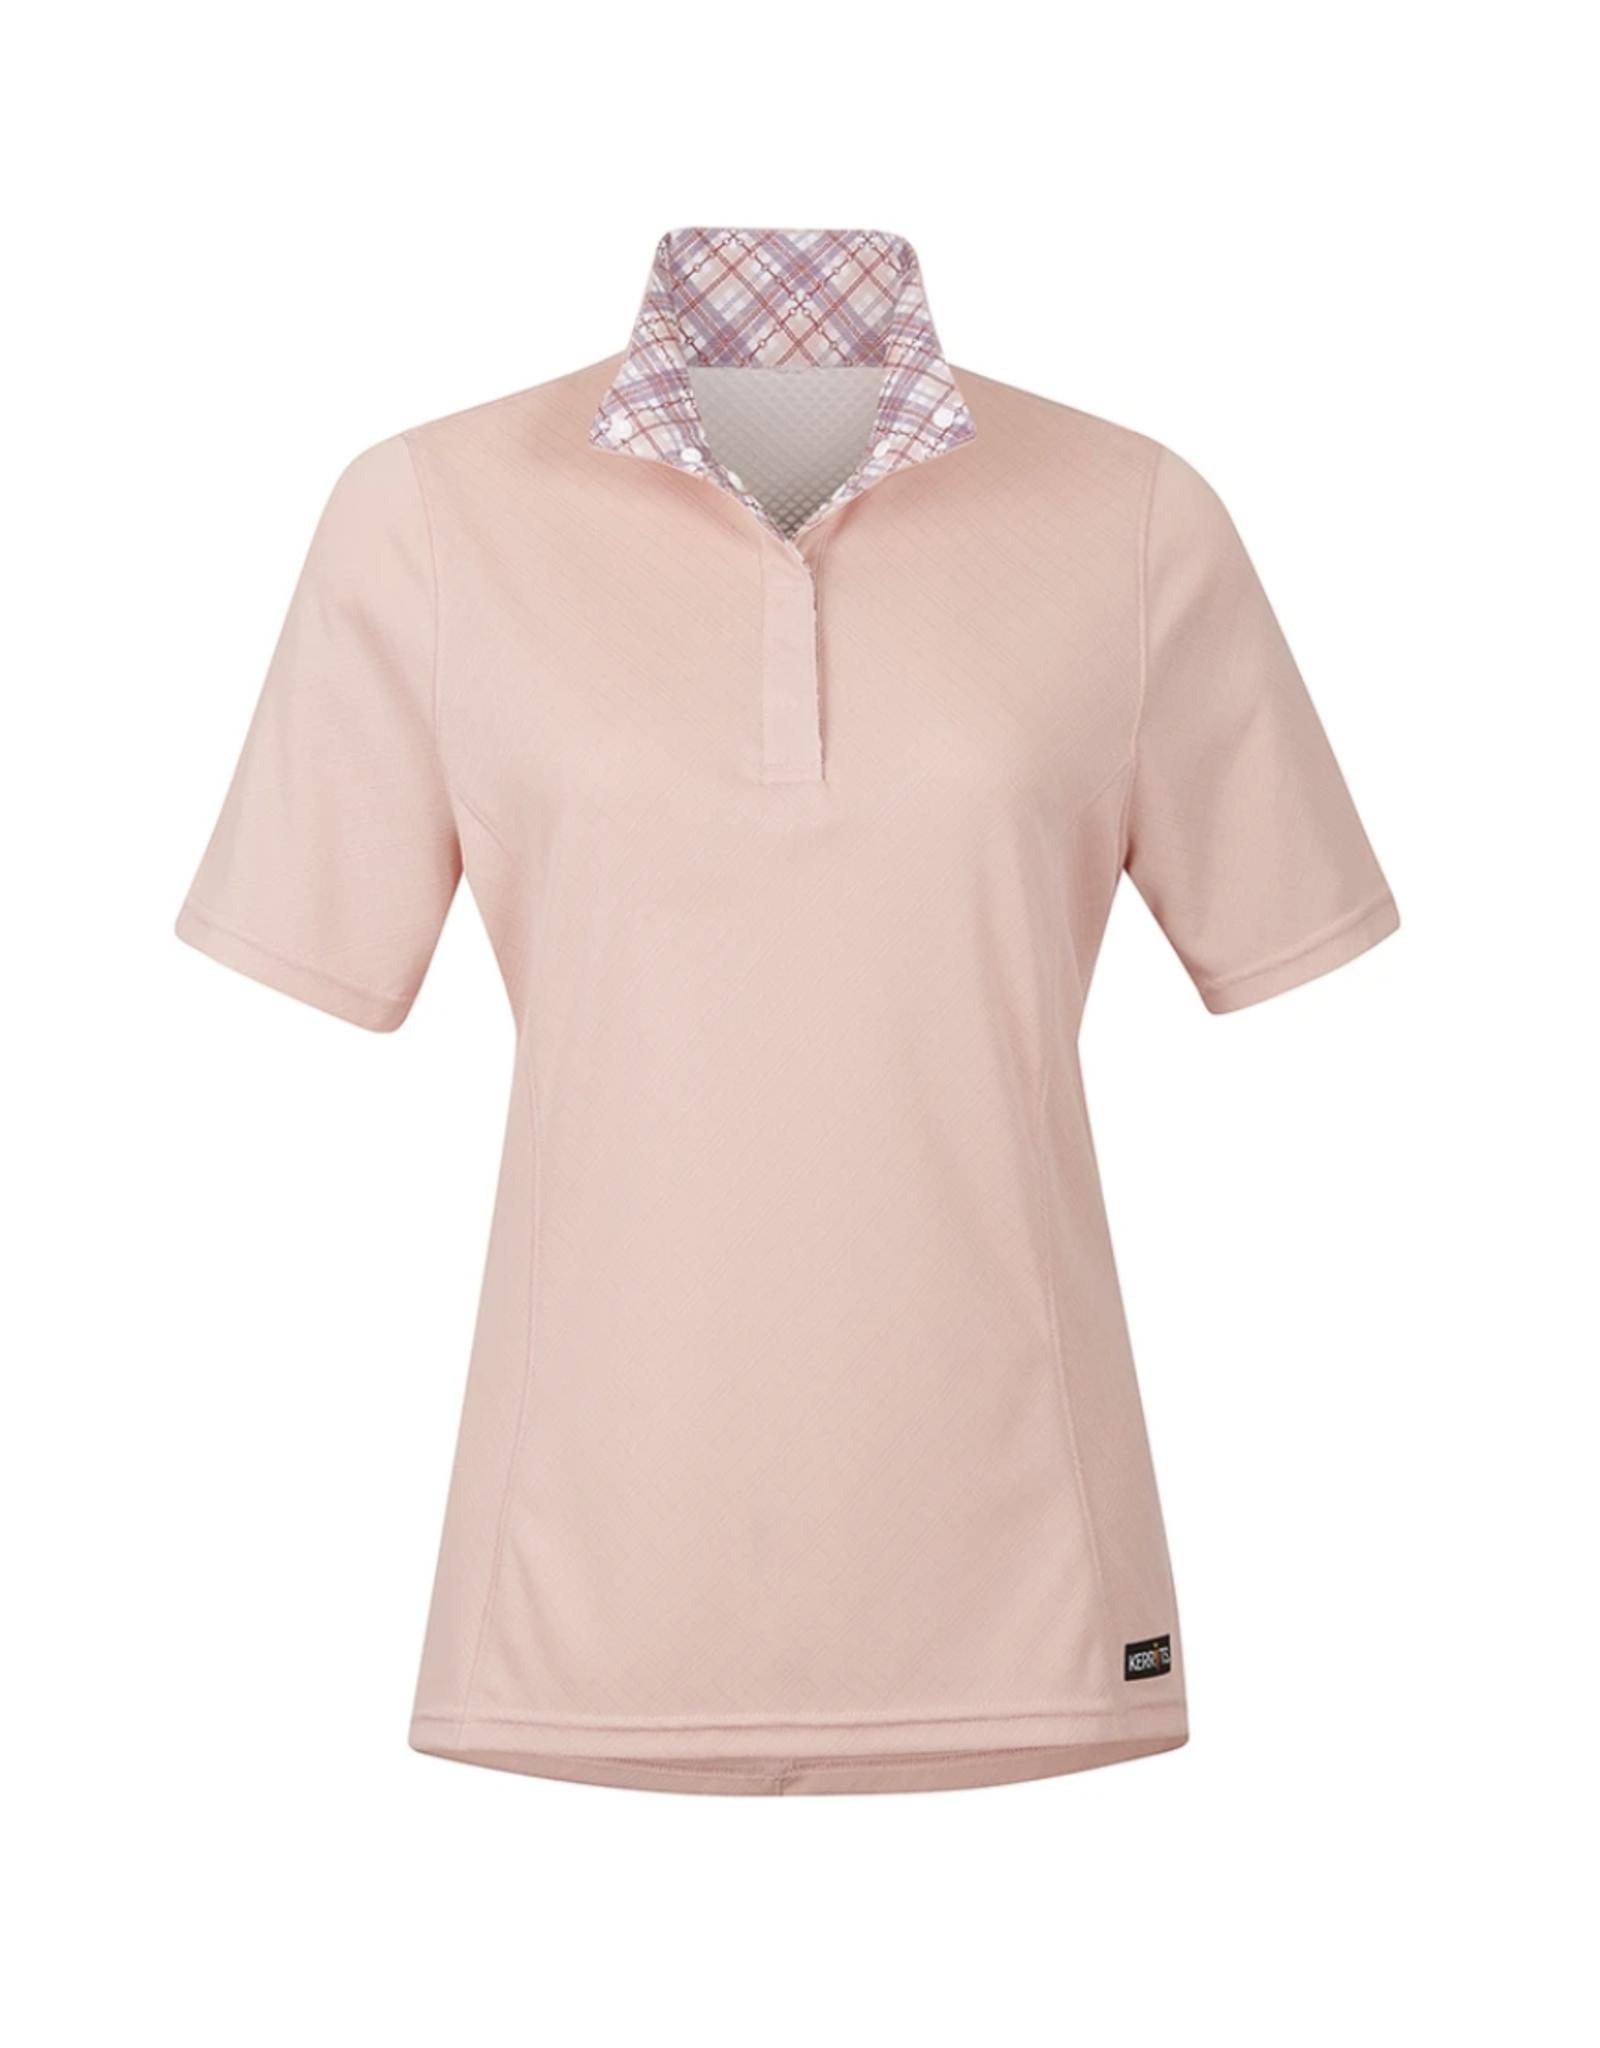 Kerrits Ladies' Encore Short Sleeve Shirt